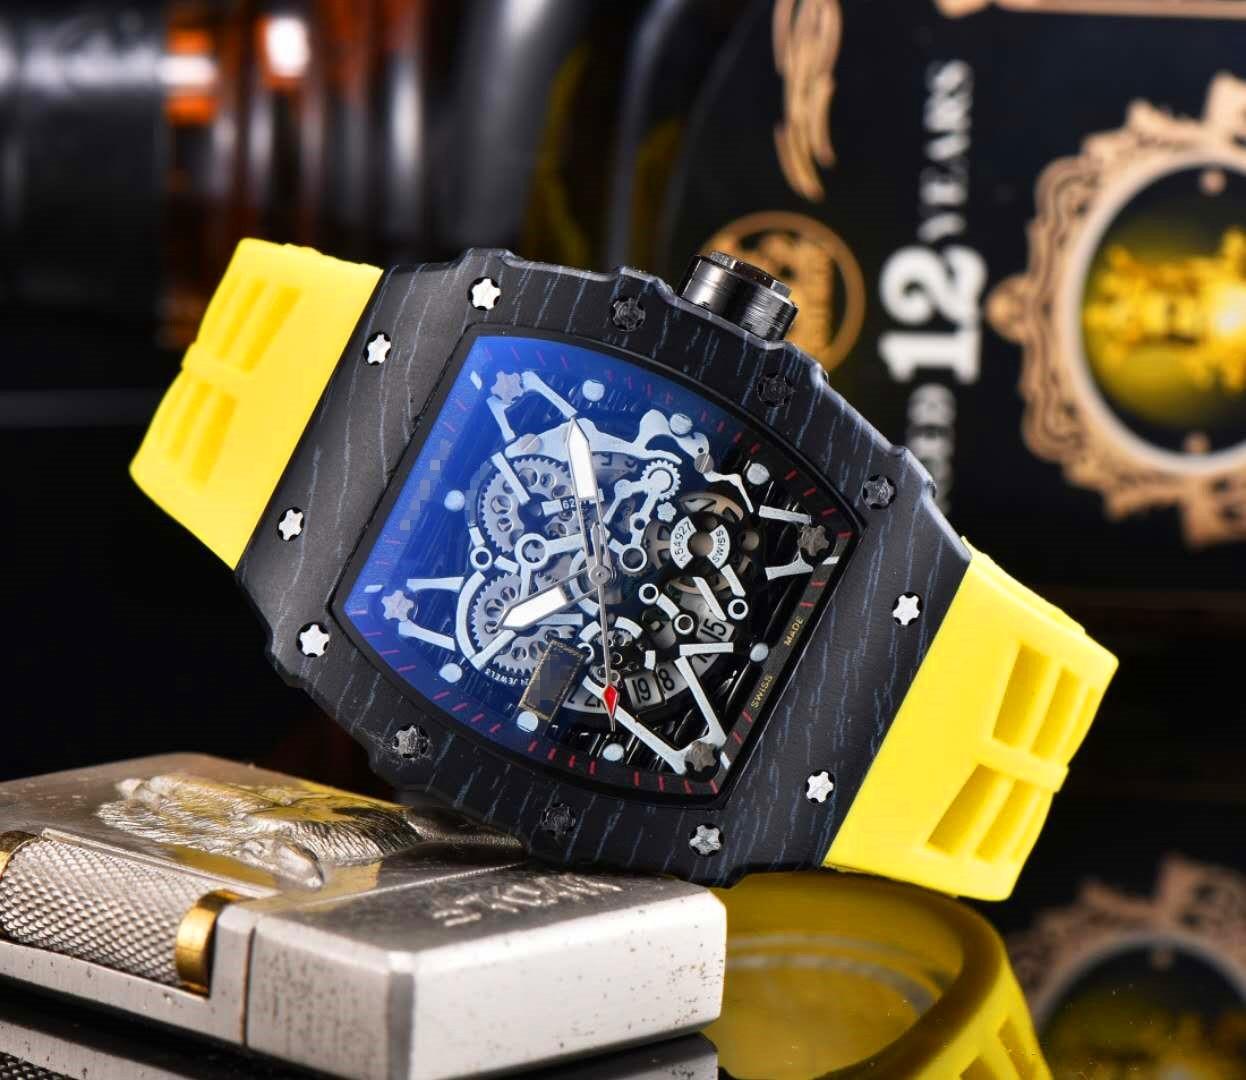 RM Richard Luxury Quartz Watches New Top Brand Mille Mens Automatic Watch Men's Designer Wristwacth Water Resistant Reloj Hombre